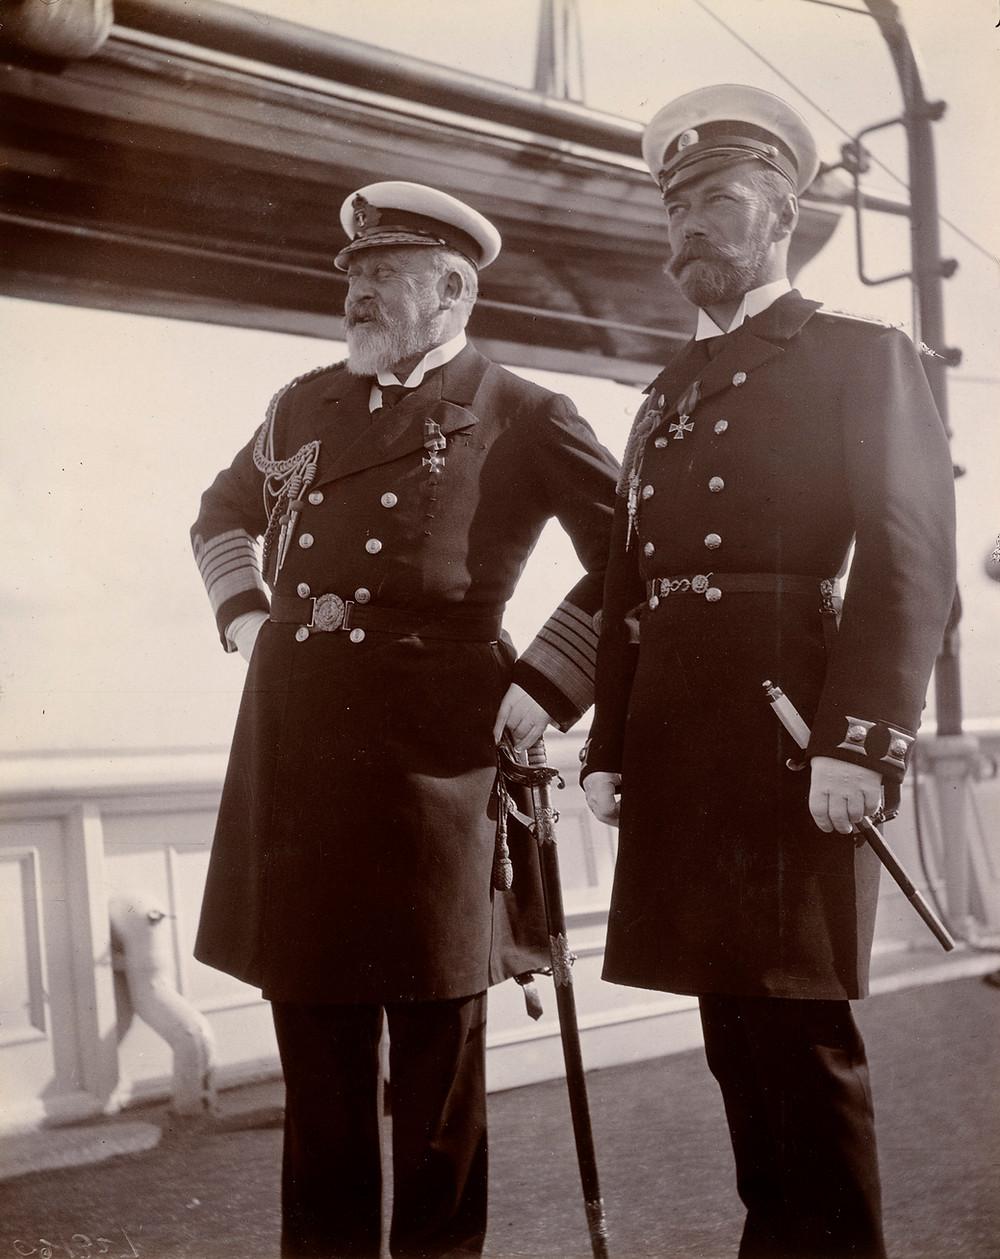 King Edward VII & Tsar Nicholas II,Jun 1908. Royal Collection Trust/(c) Her Majesty Queen Elizabeth II 2019